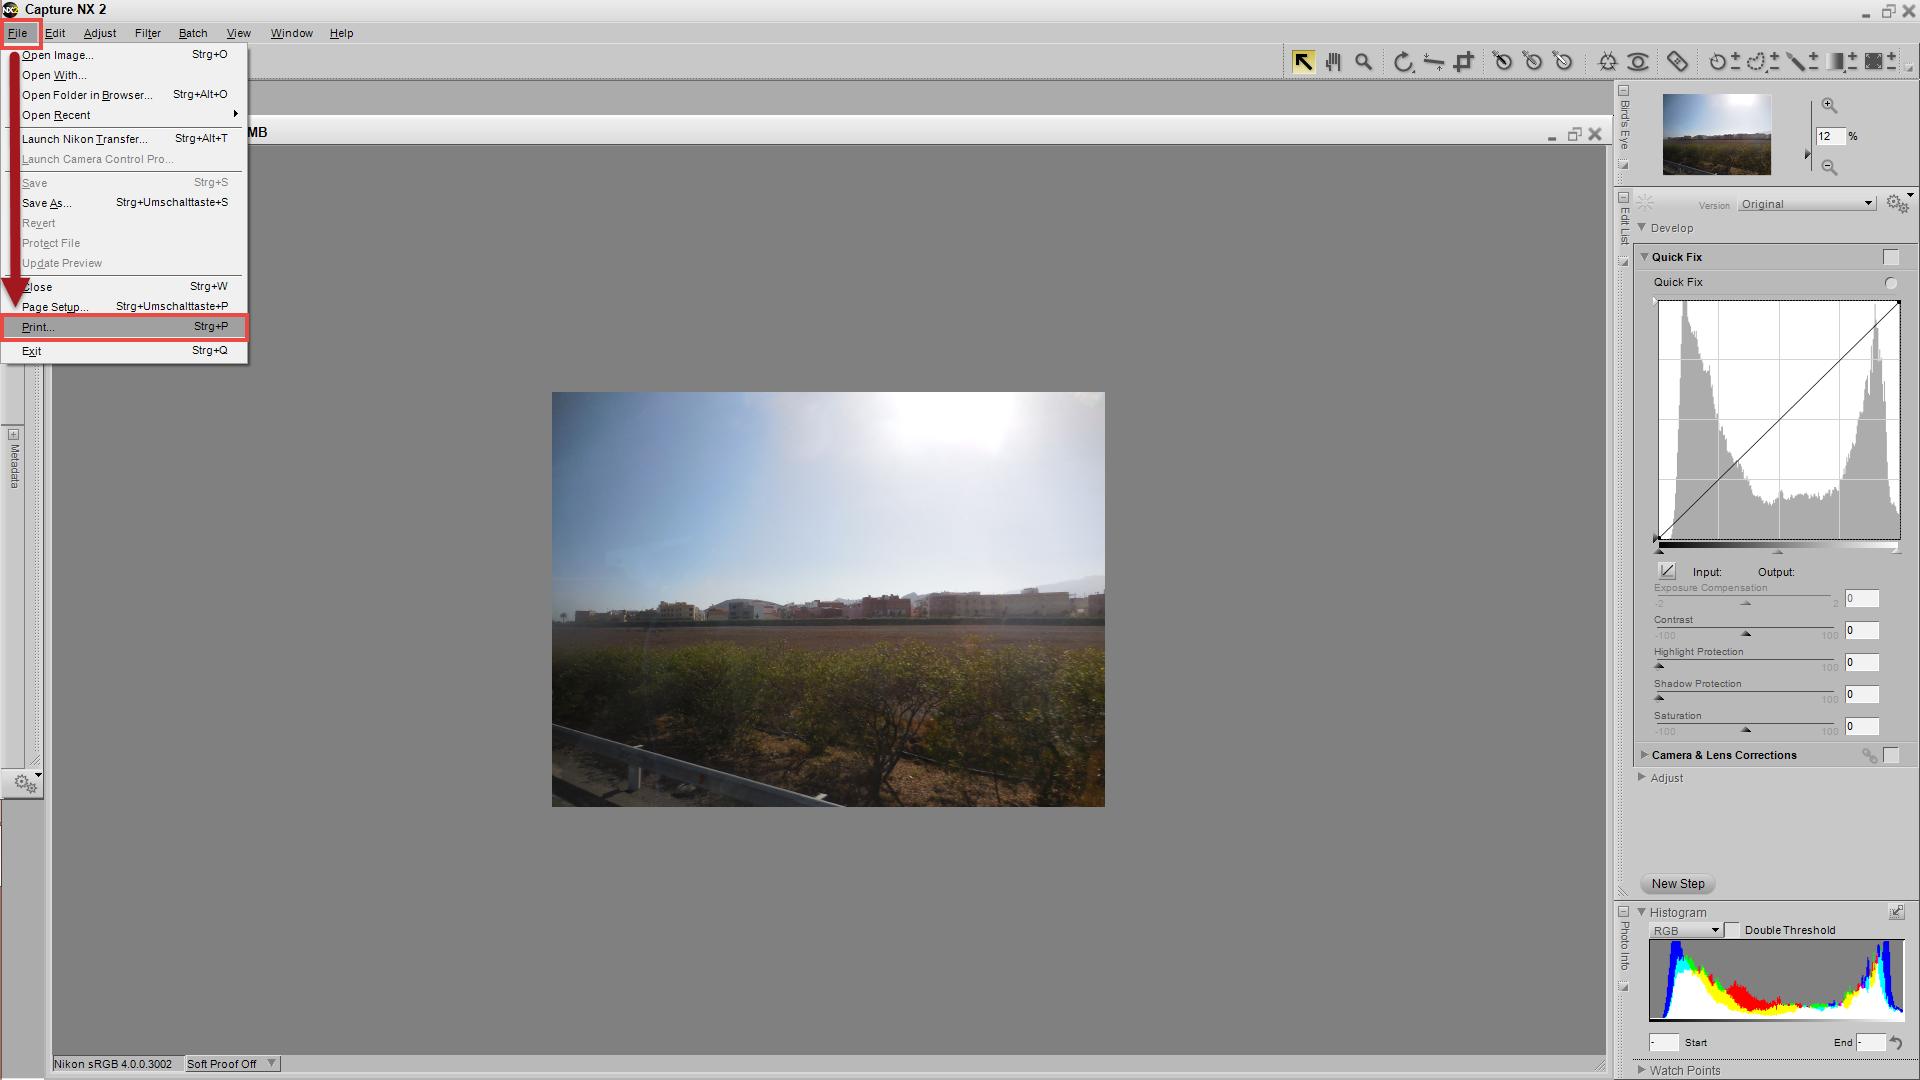 Capture NX 2 - File/Print